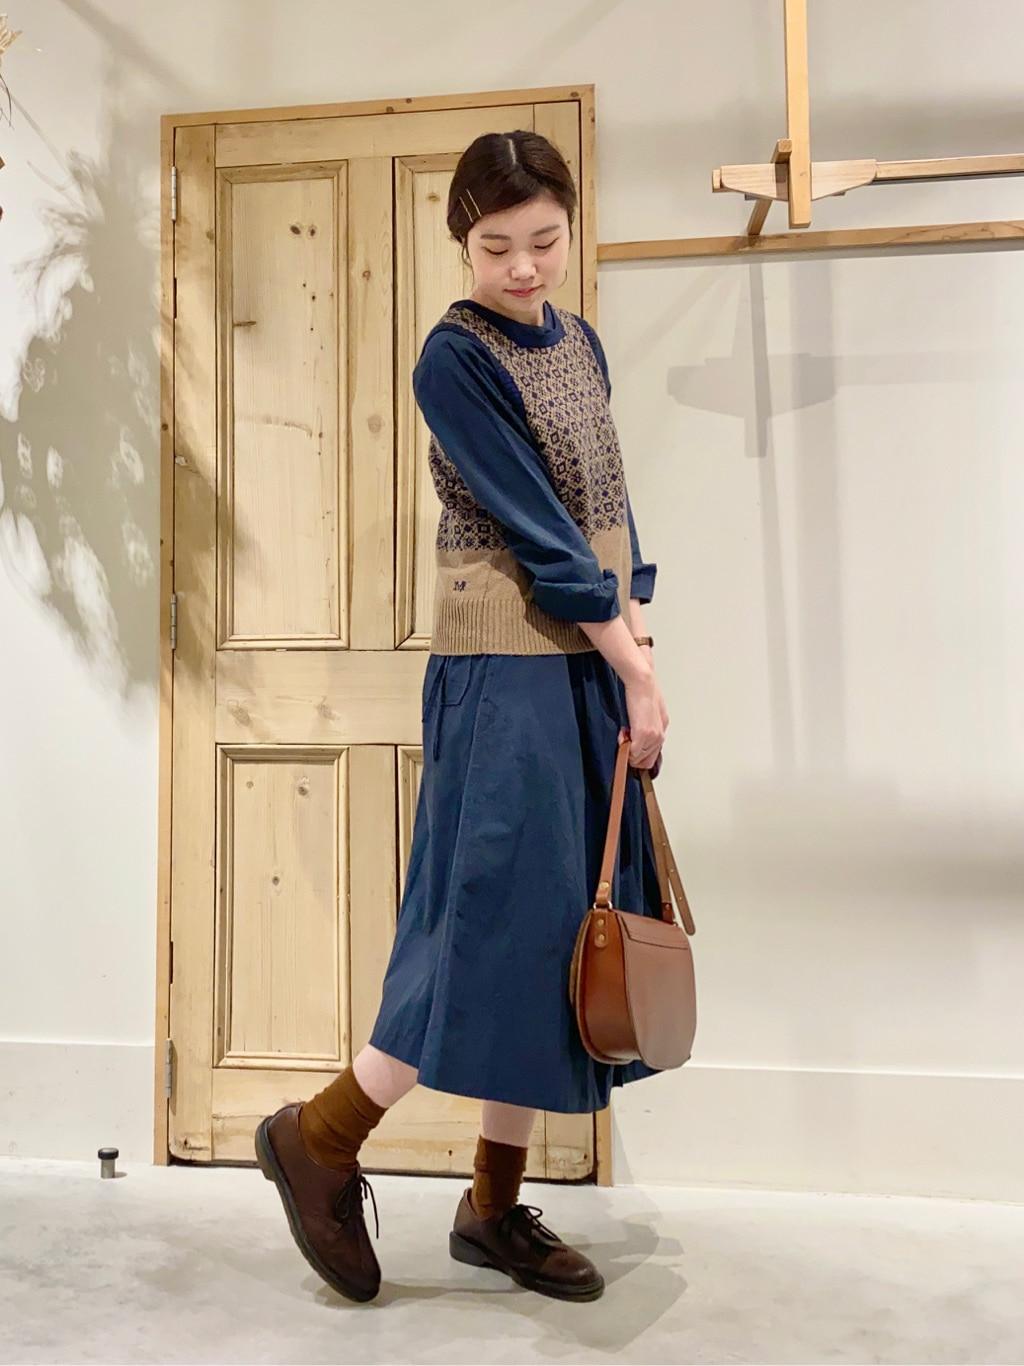 Malle chambre de charme 調布パルコ 身長:167cm 2020.09.12